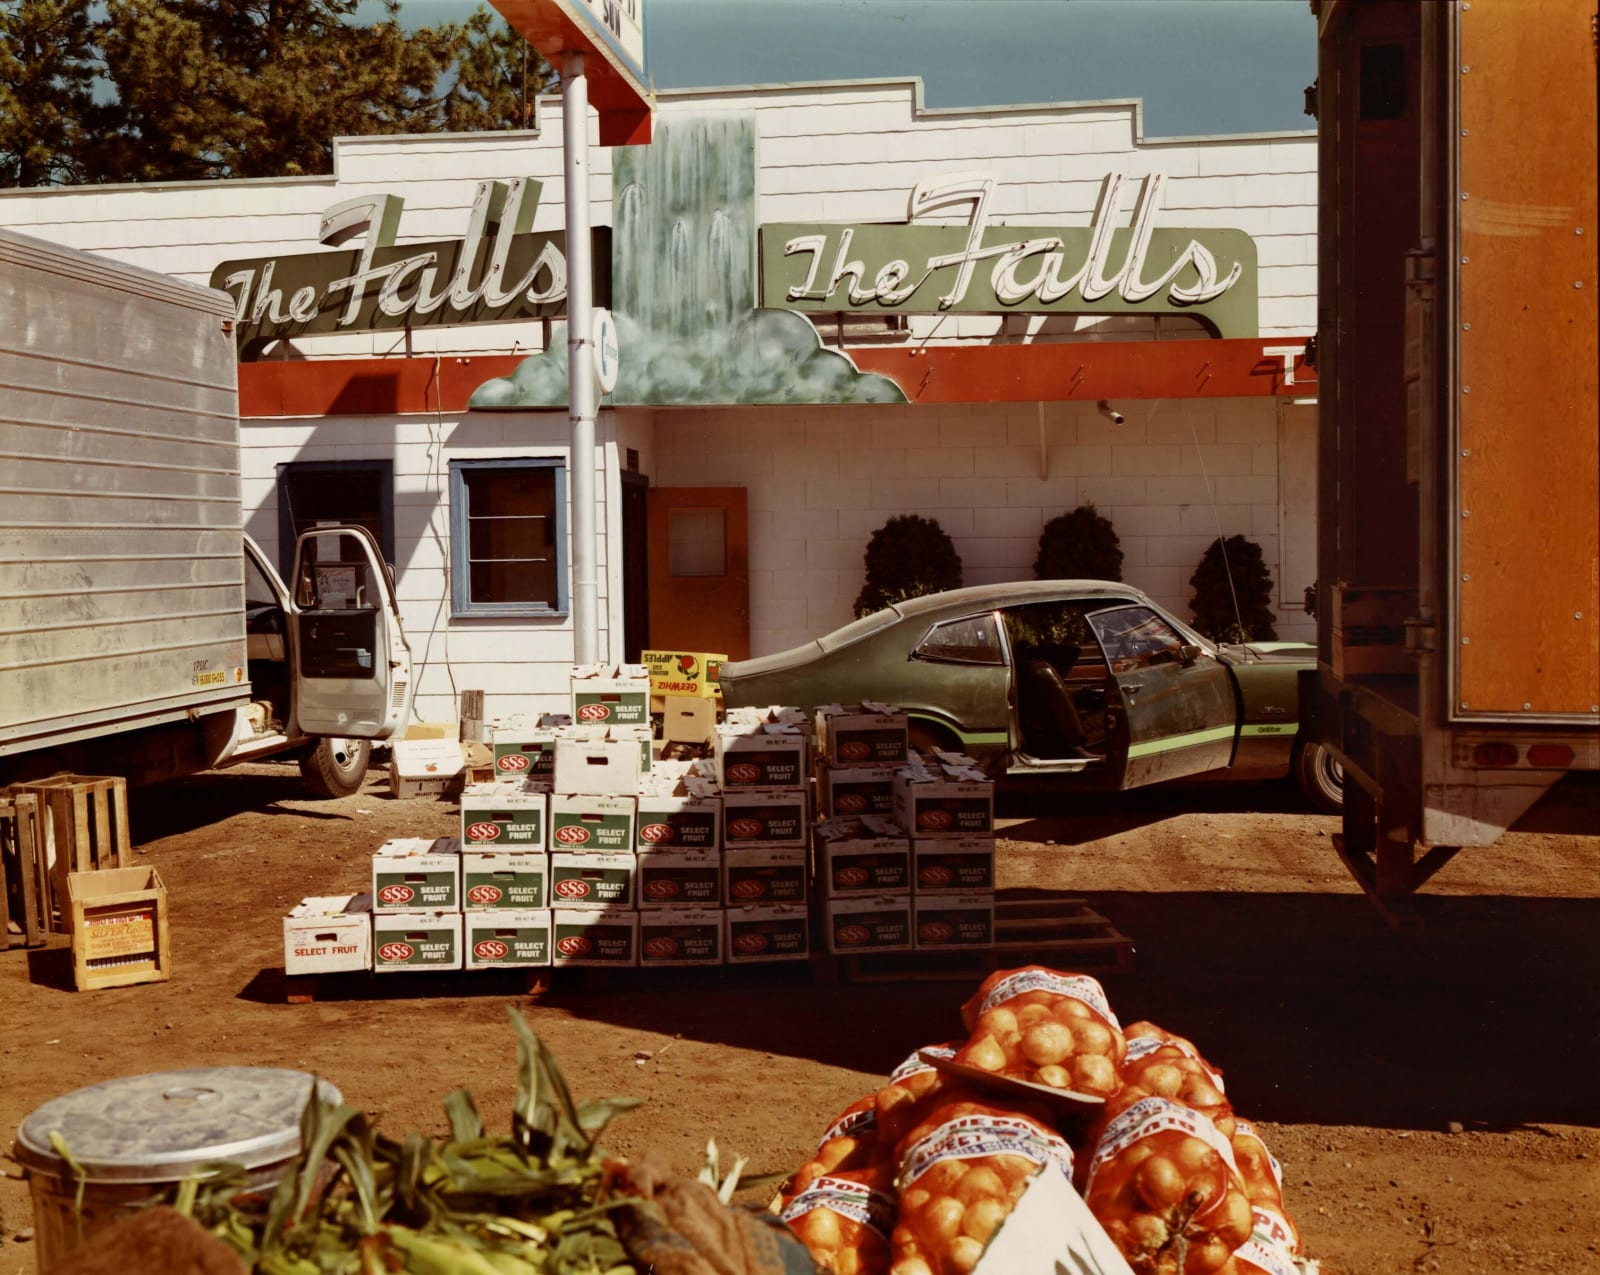 Stephen Shore, U.S. 10, Post Falls, Idaho, August 25, 1974